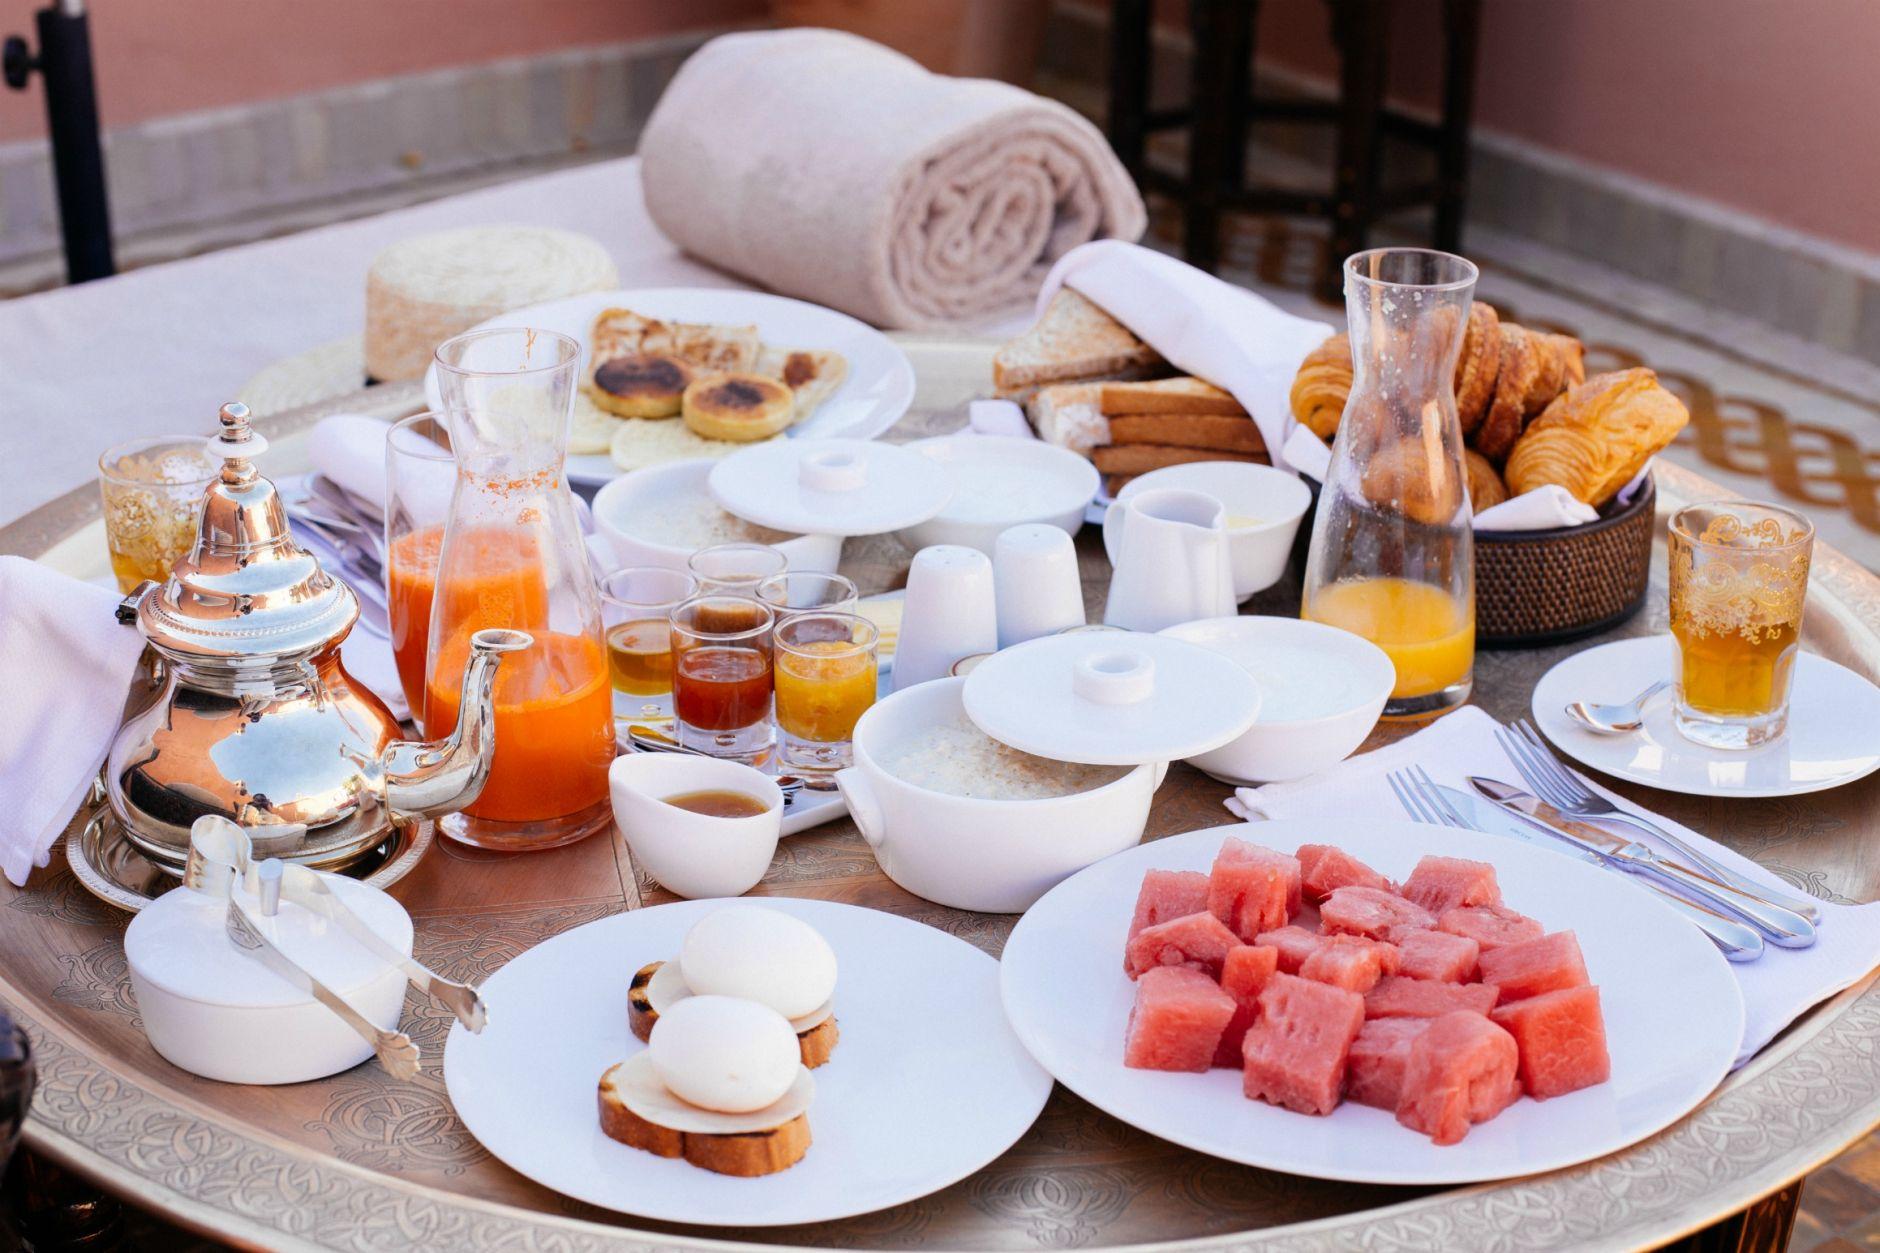 royal-mansour-hotel-luxury-marrakesch-marrakesh-morocco-edisa-shahini-disicouture-blog-48